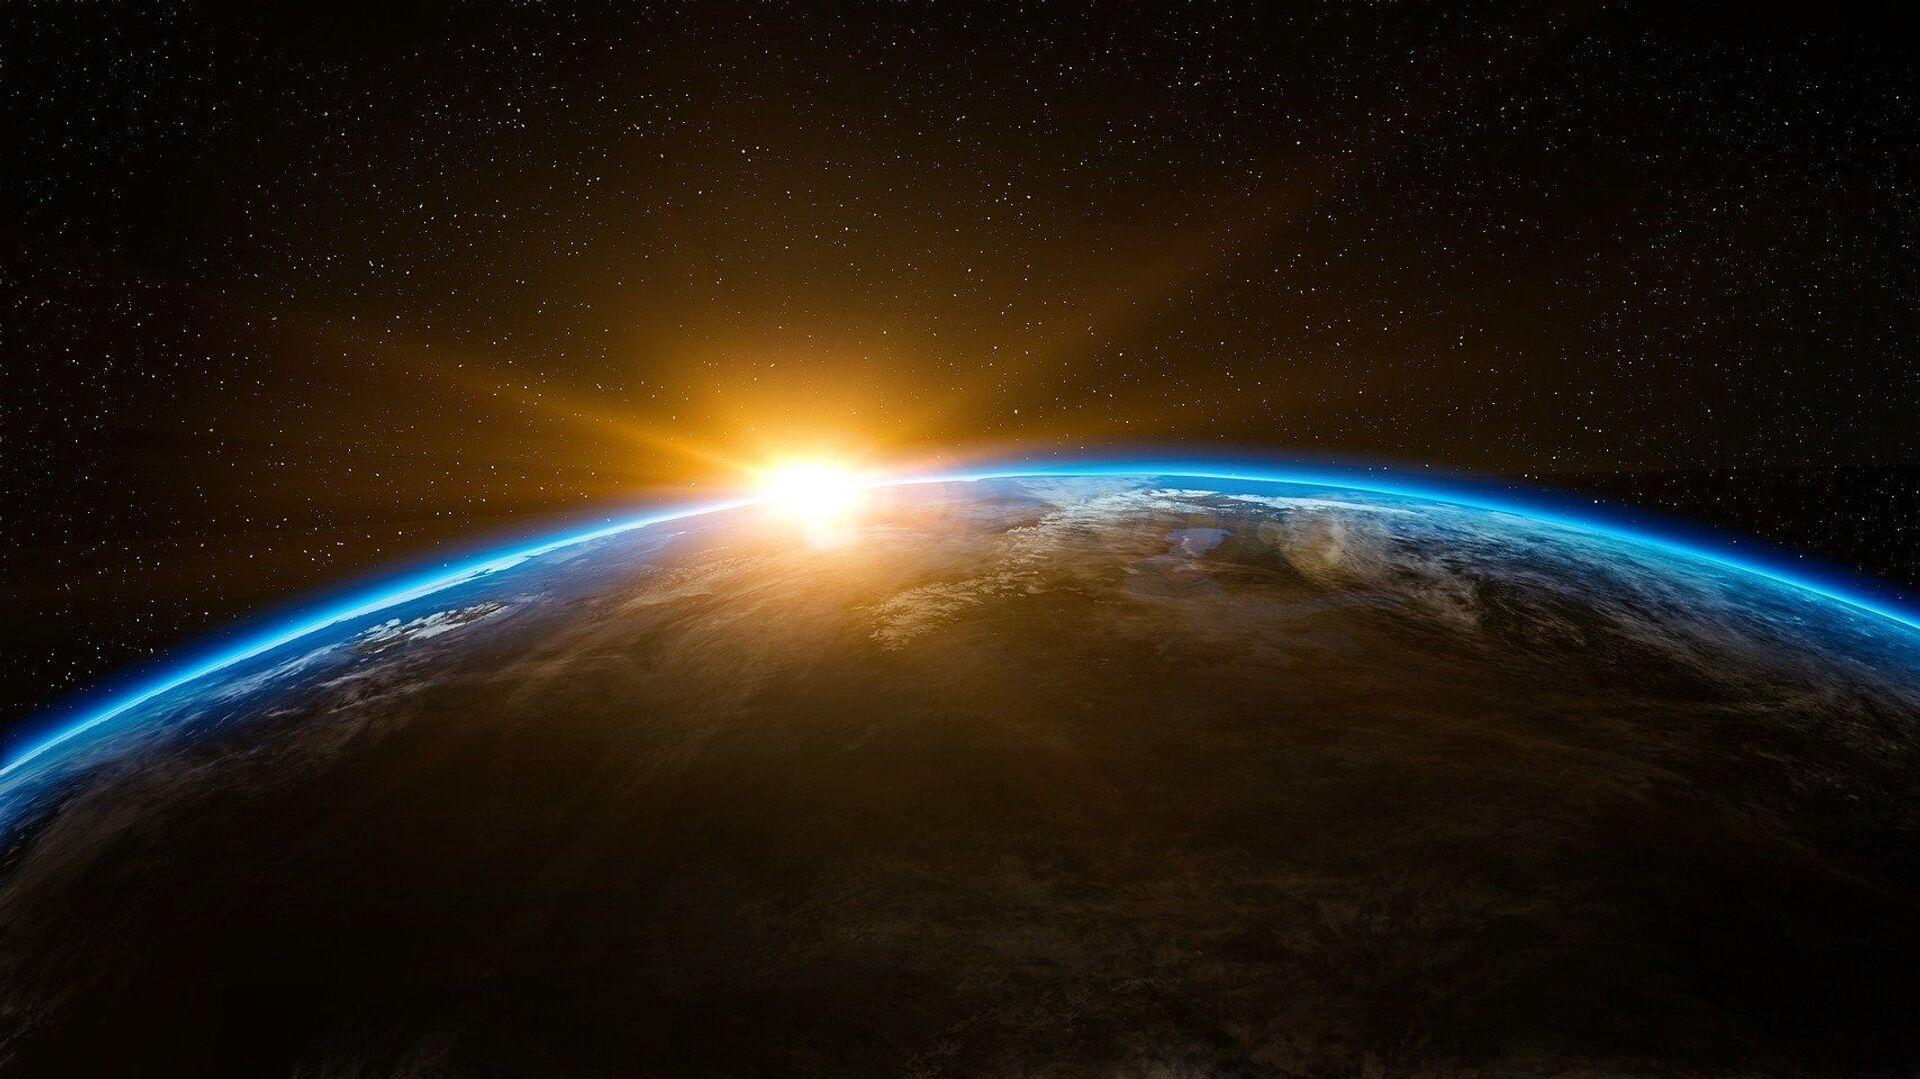 El Sol se levanta sobre la Tierra - Sputnik Mundo, 1920, 24.09.2021